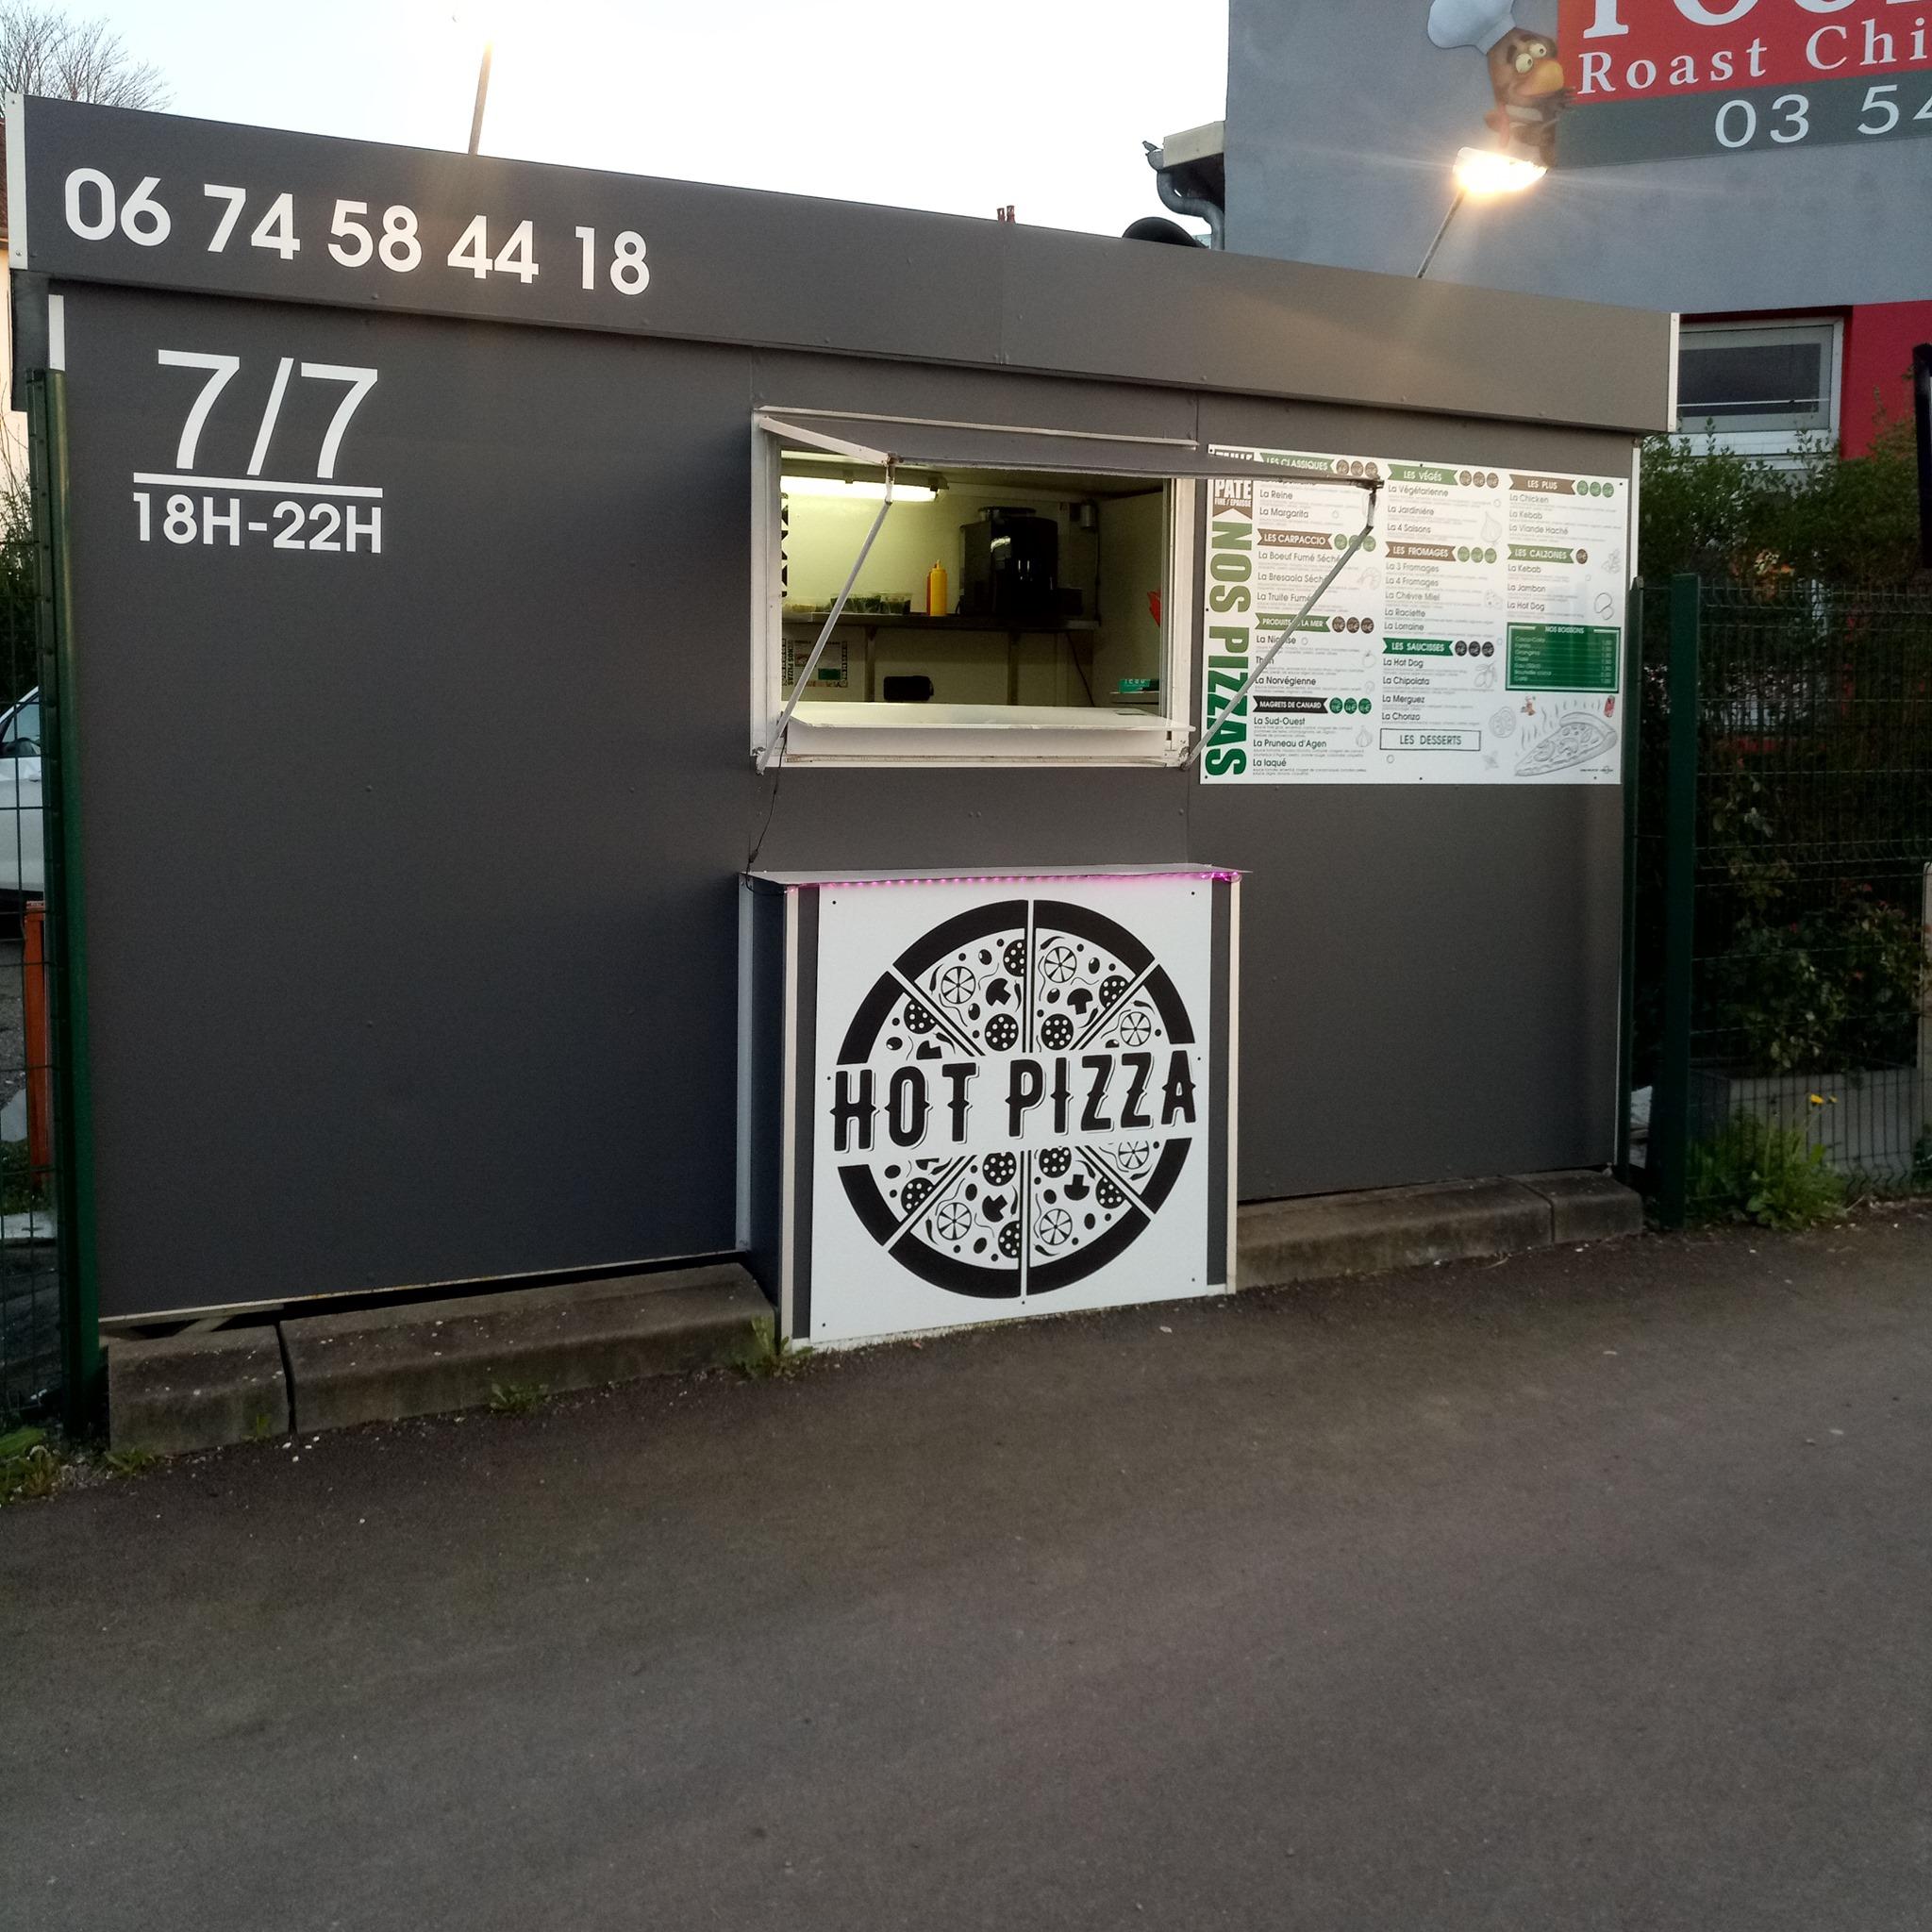 PIZZERIA HOT PIZZA